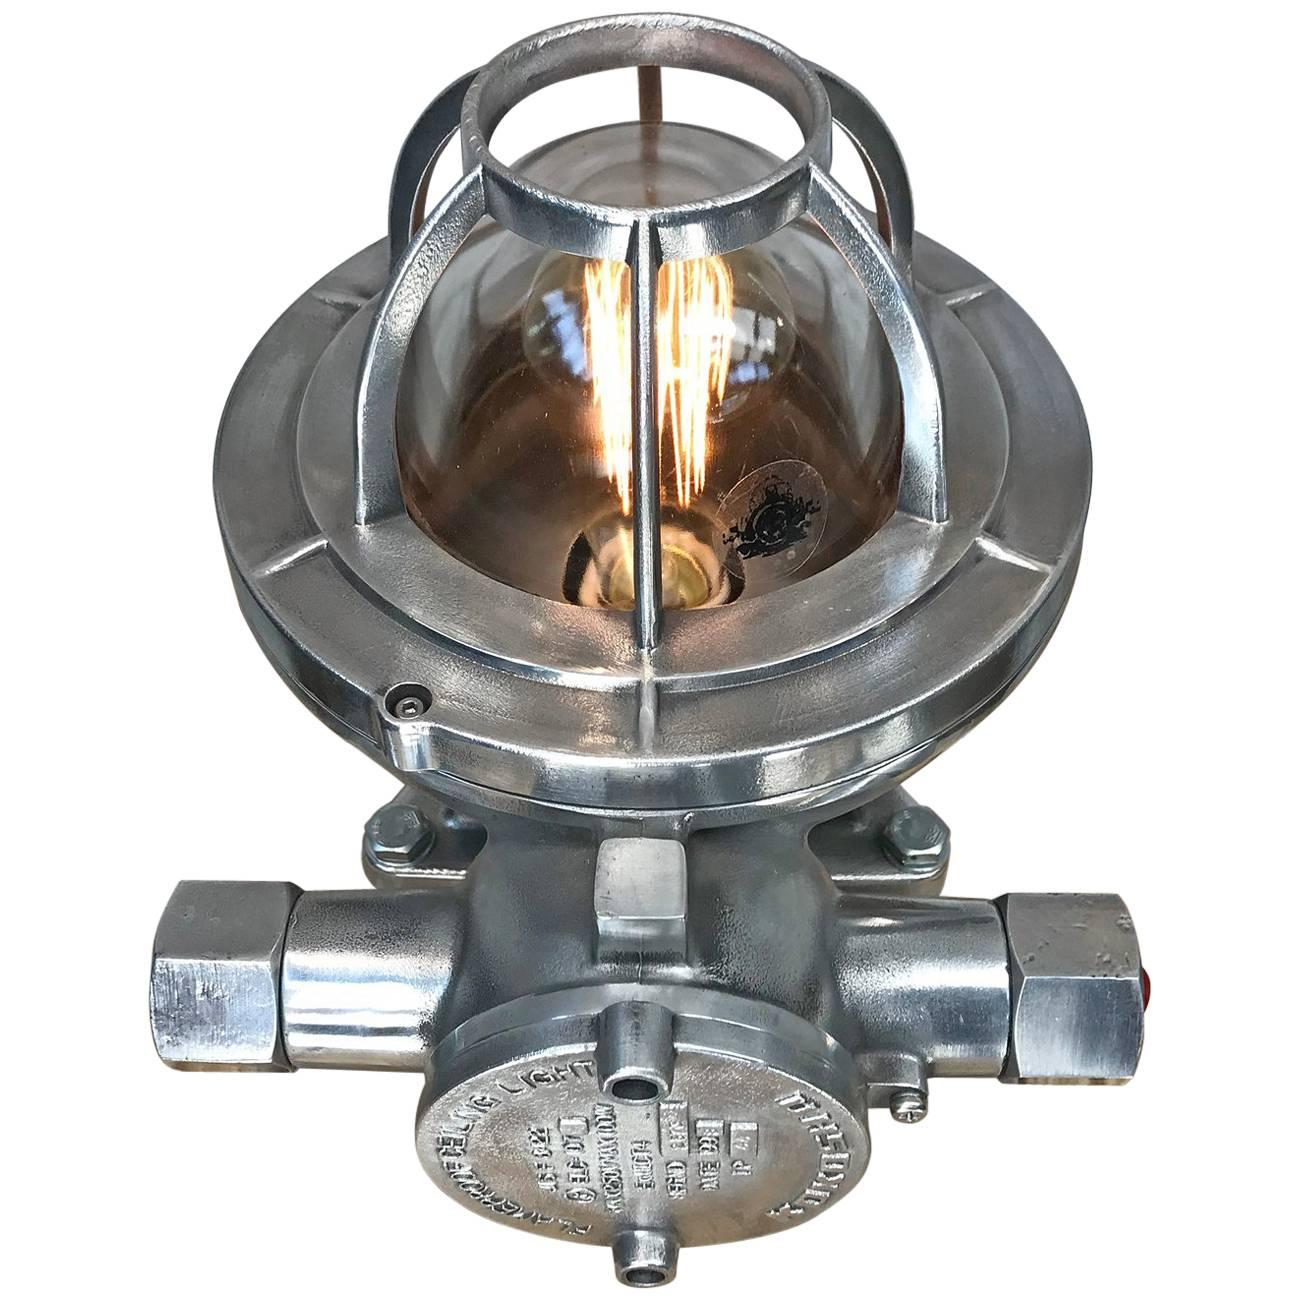 Late Century Japanese Cast Aluminium Industrial Flameproof Table Lamp, Edison